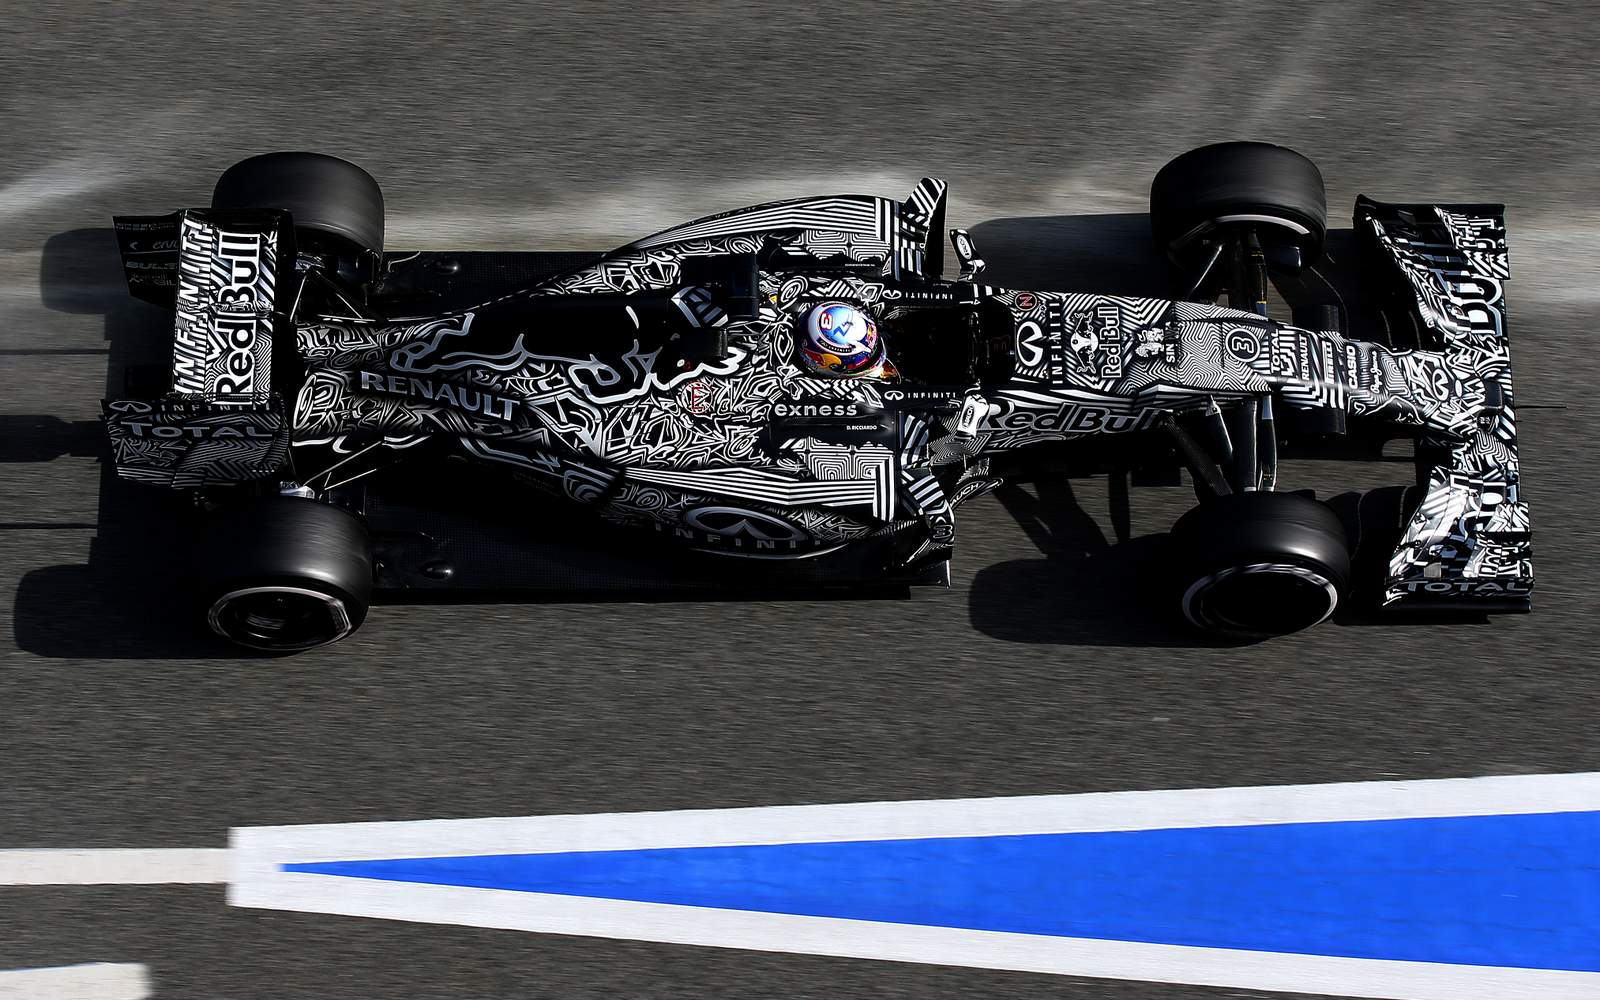 Red Bull Racing F-1 2015